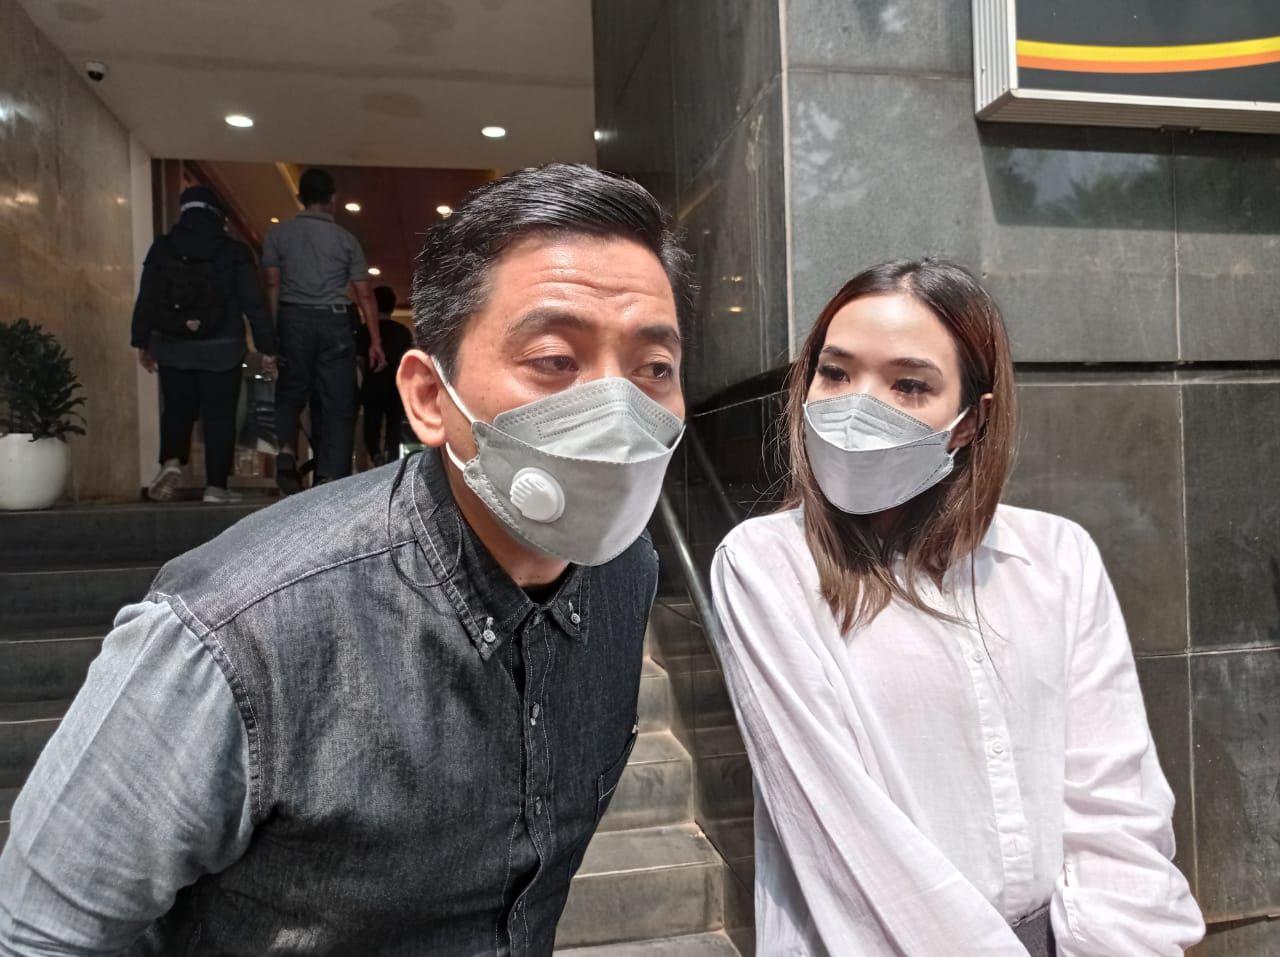 Gisella Anastasia ditemani pengacaranya wajib lapor di Polda Metro Jaya.